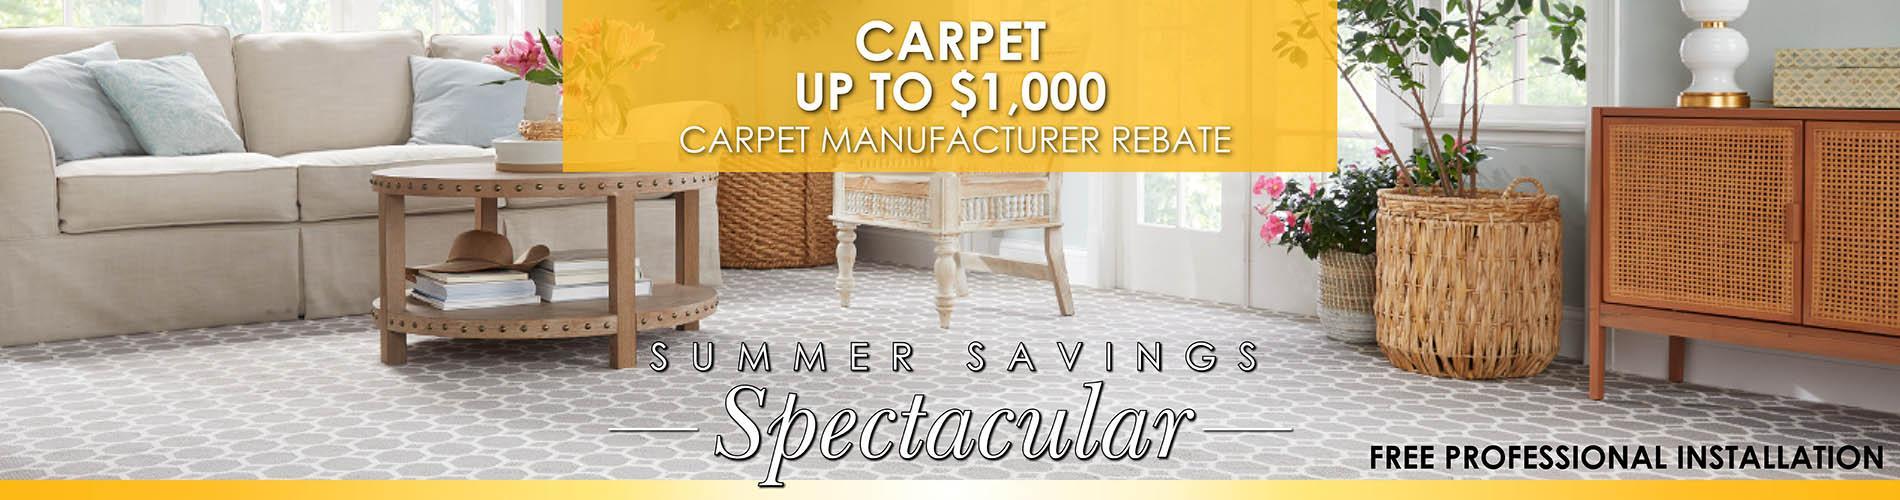 Carpet manufacturer rebate up to $1,000 during our Summer Savings Spectacular